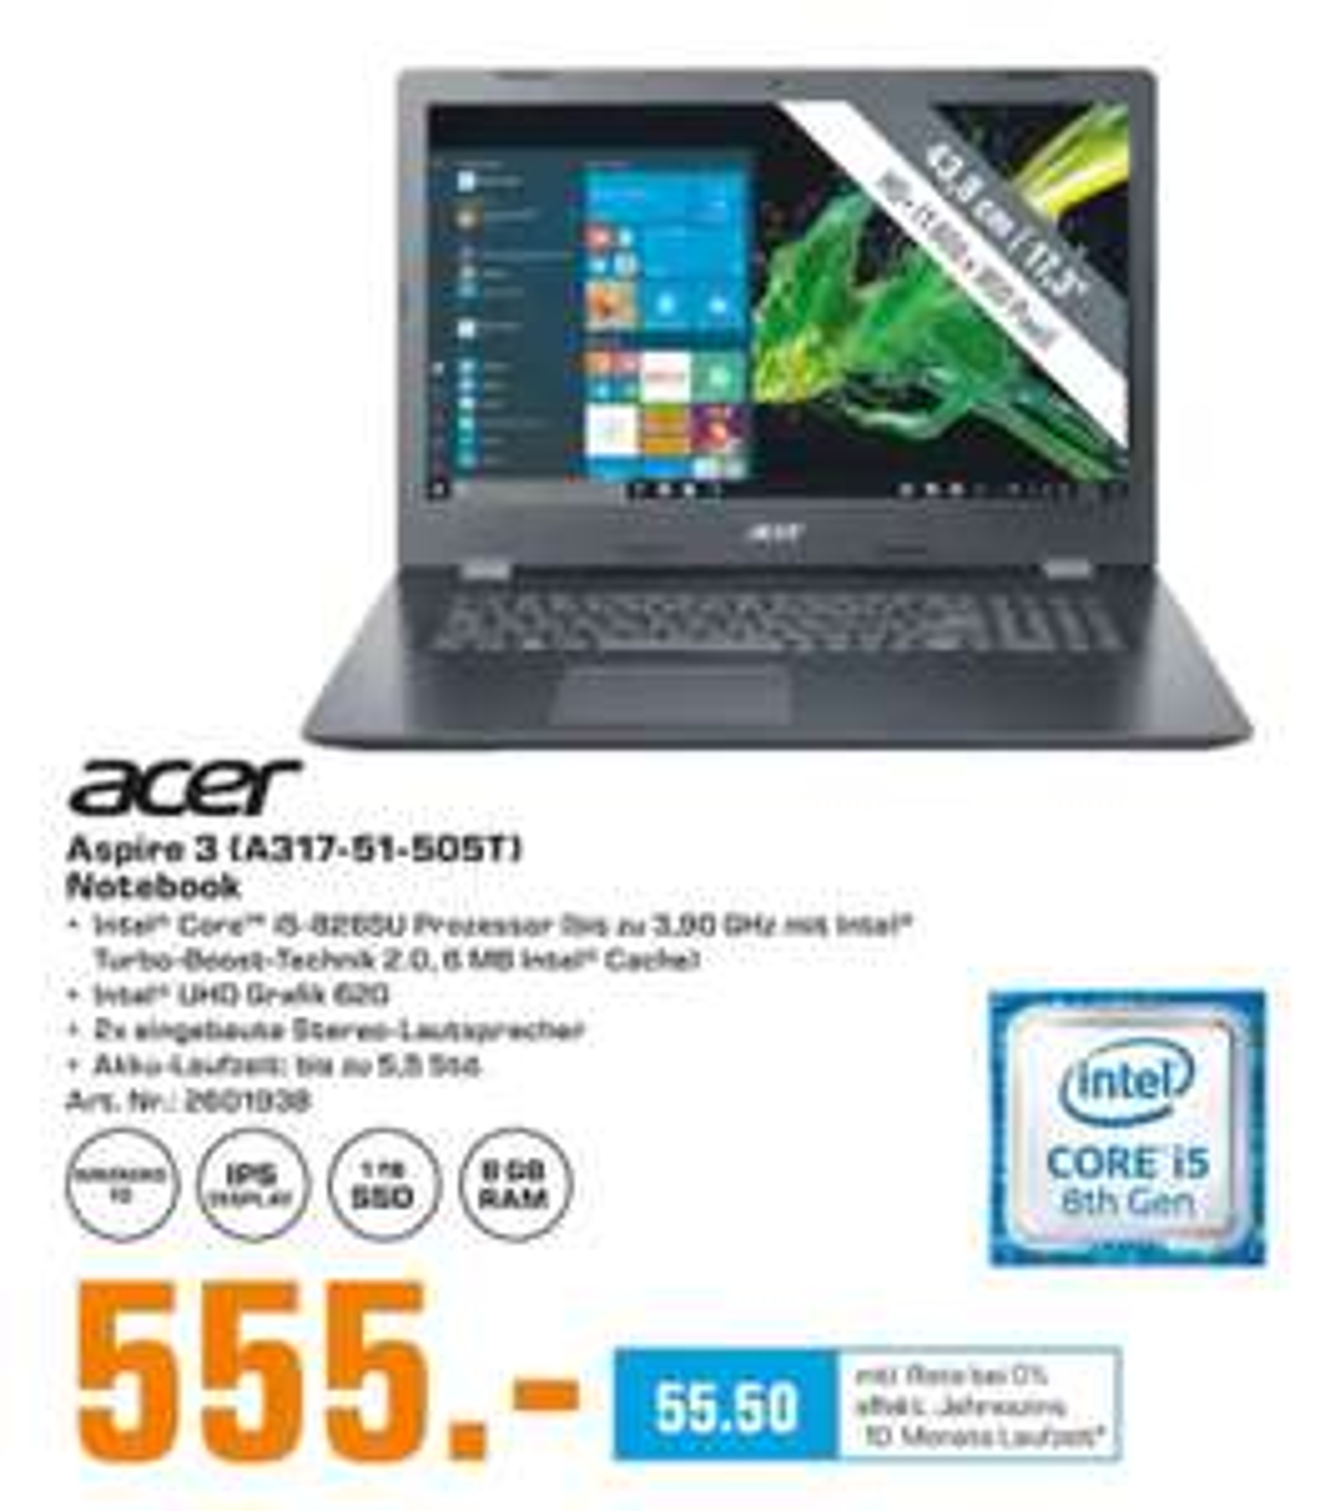 Acer A317-51-505T mit 1TB SSD